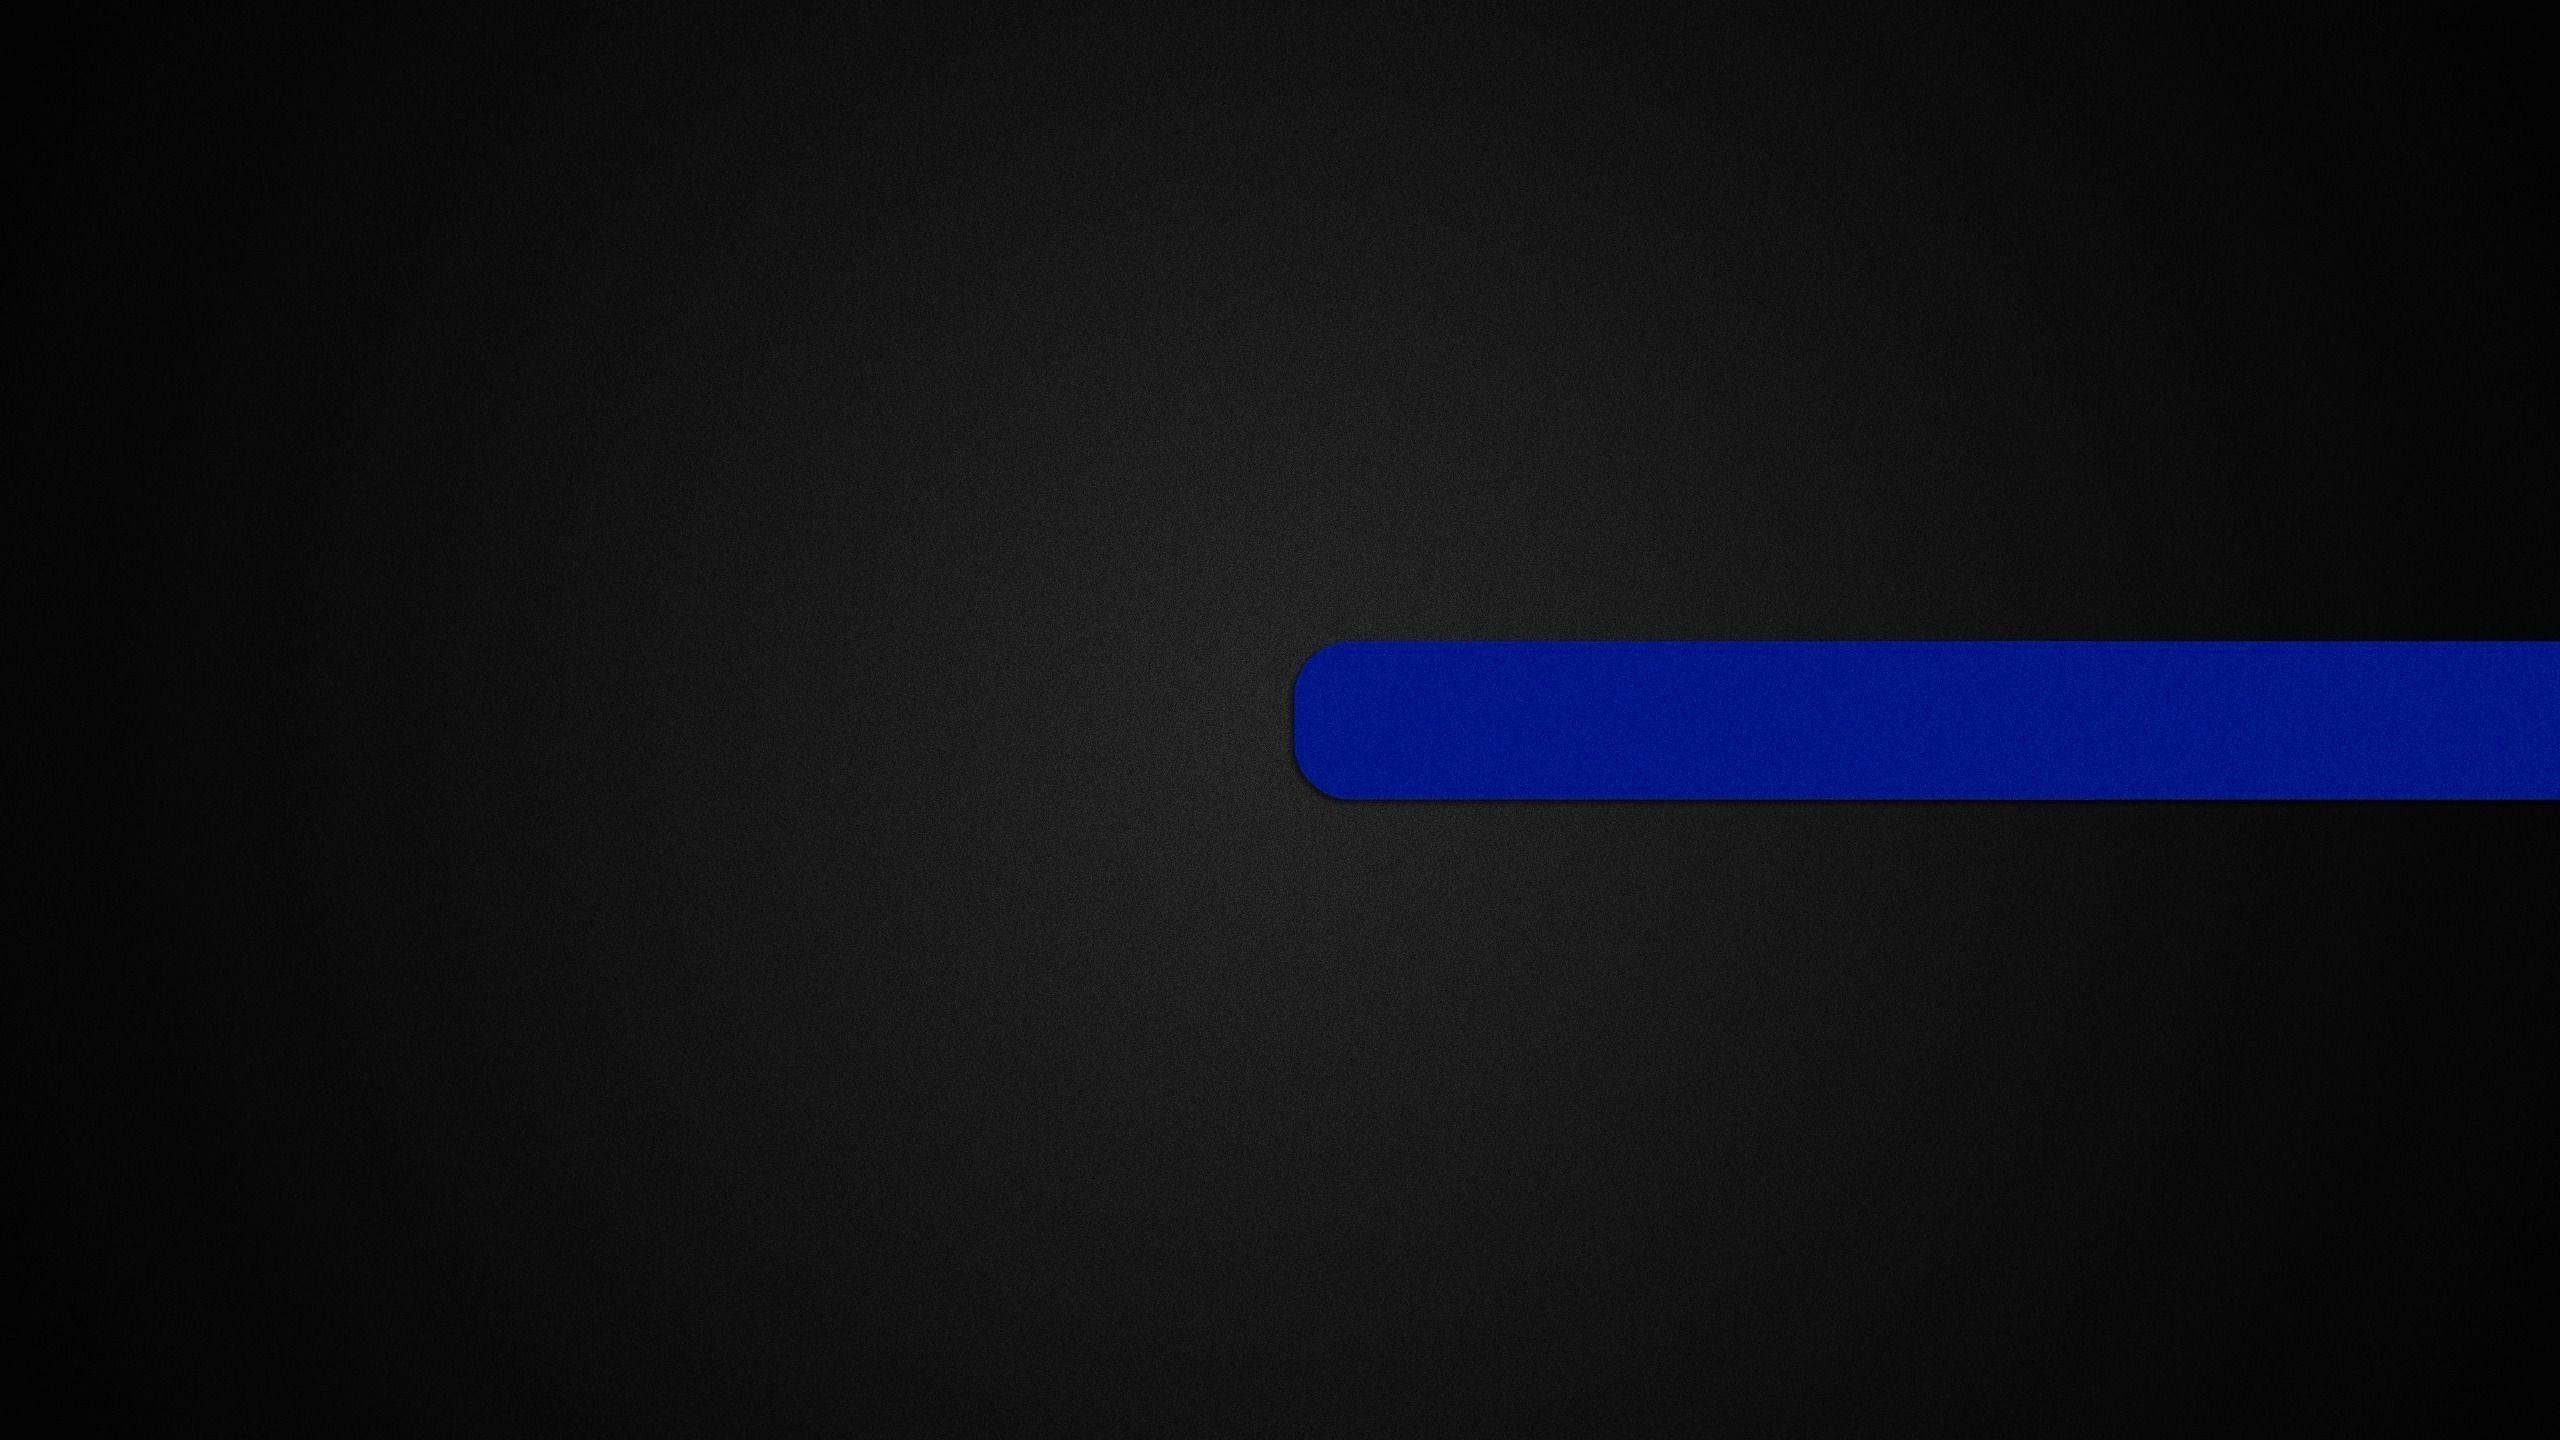 Black · Background black blue wallpapers …